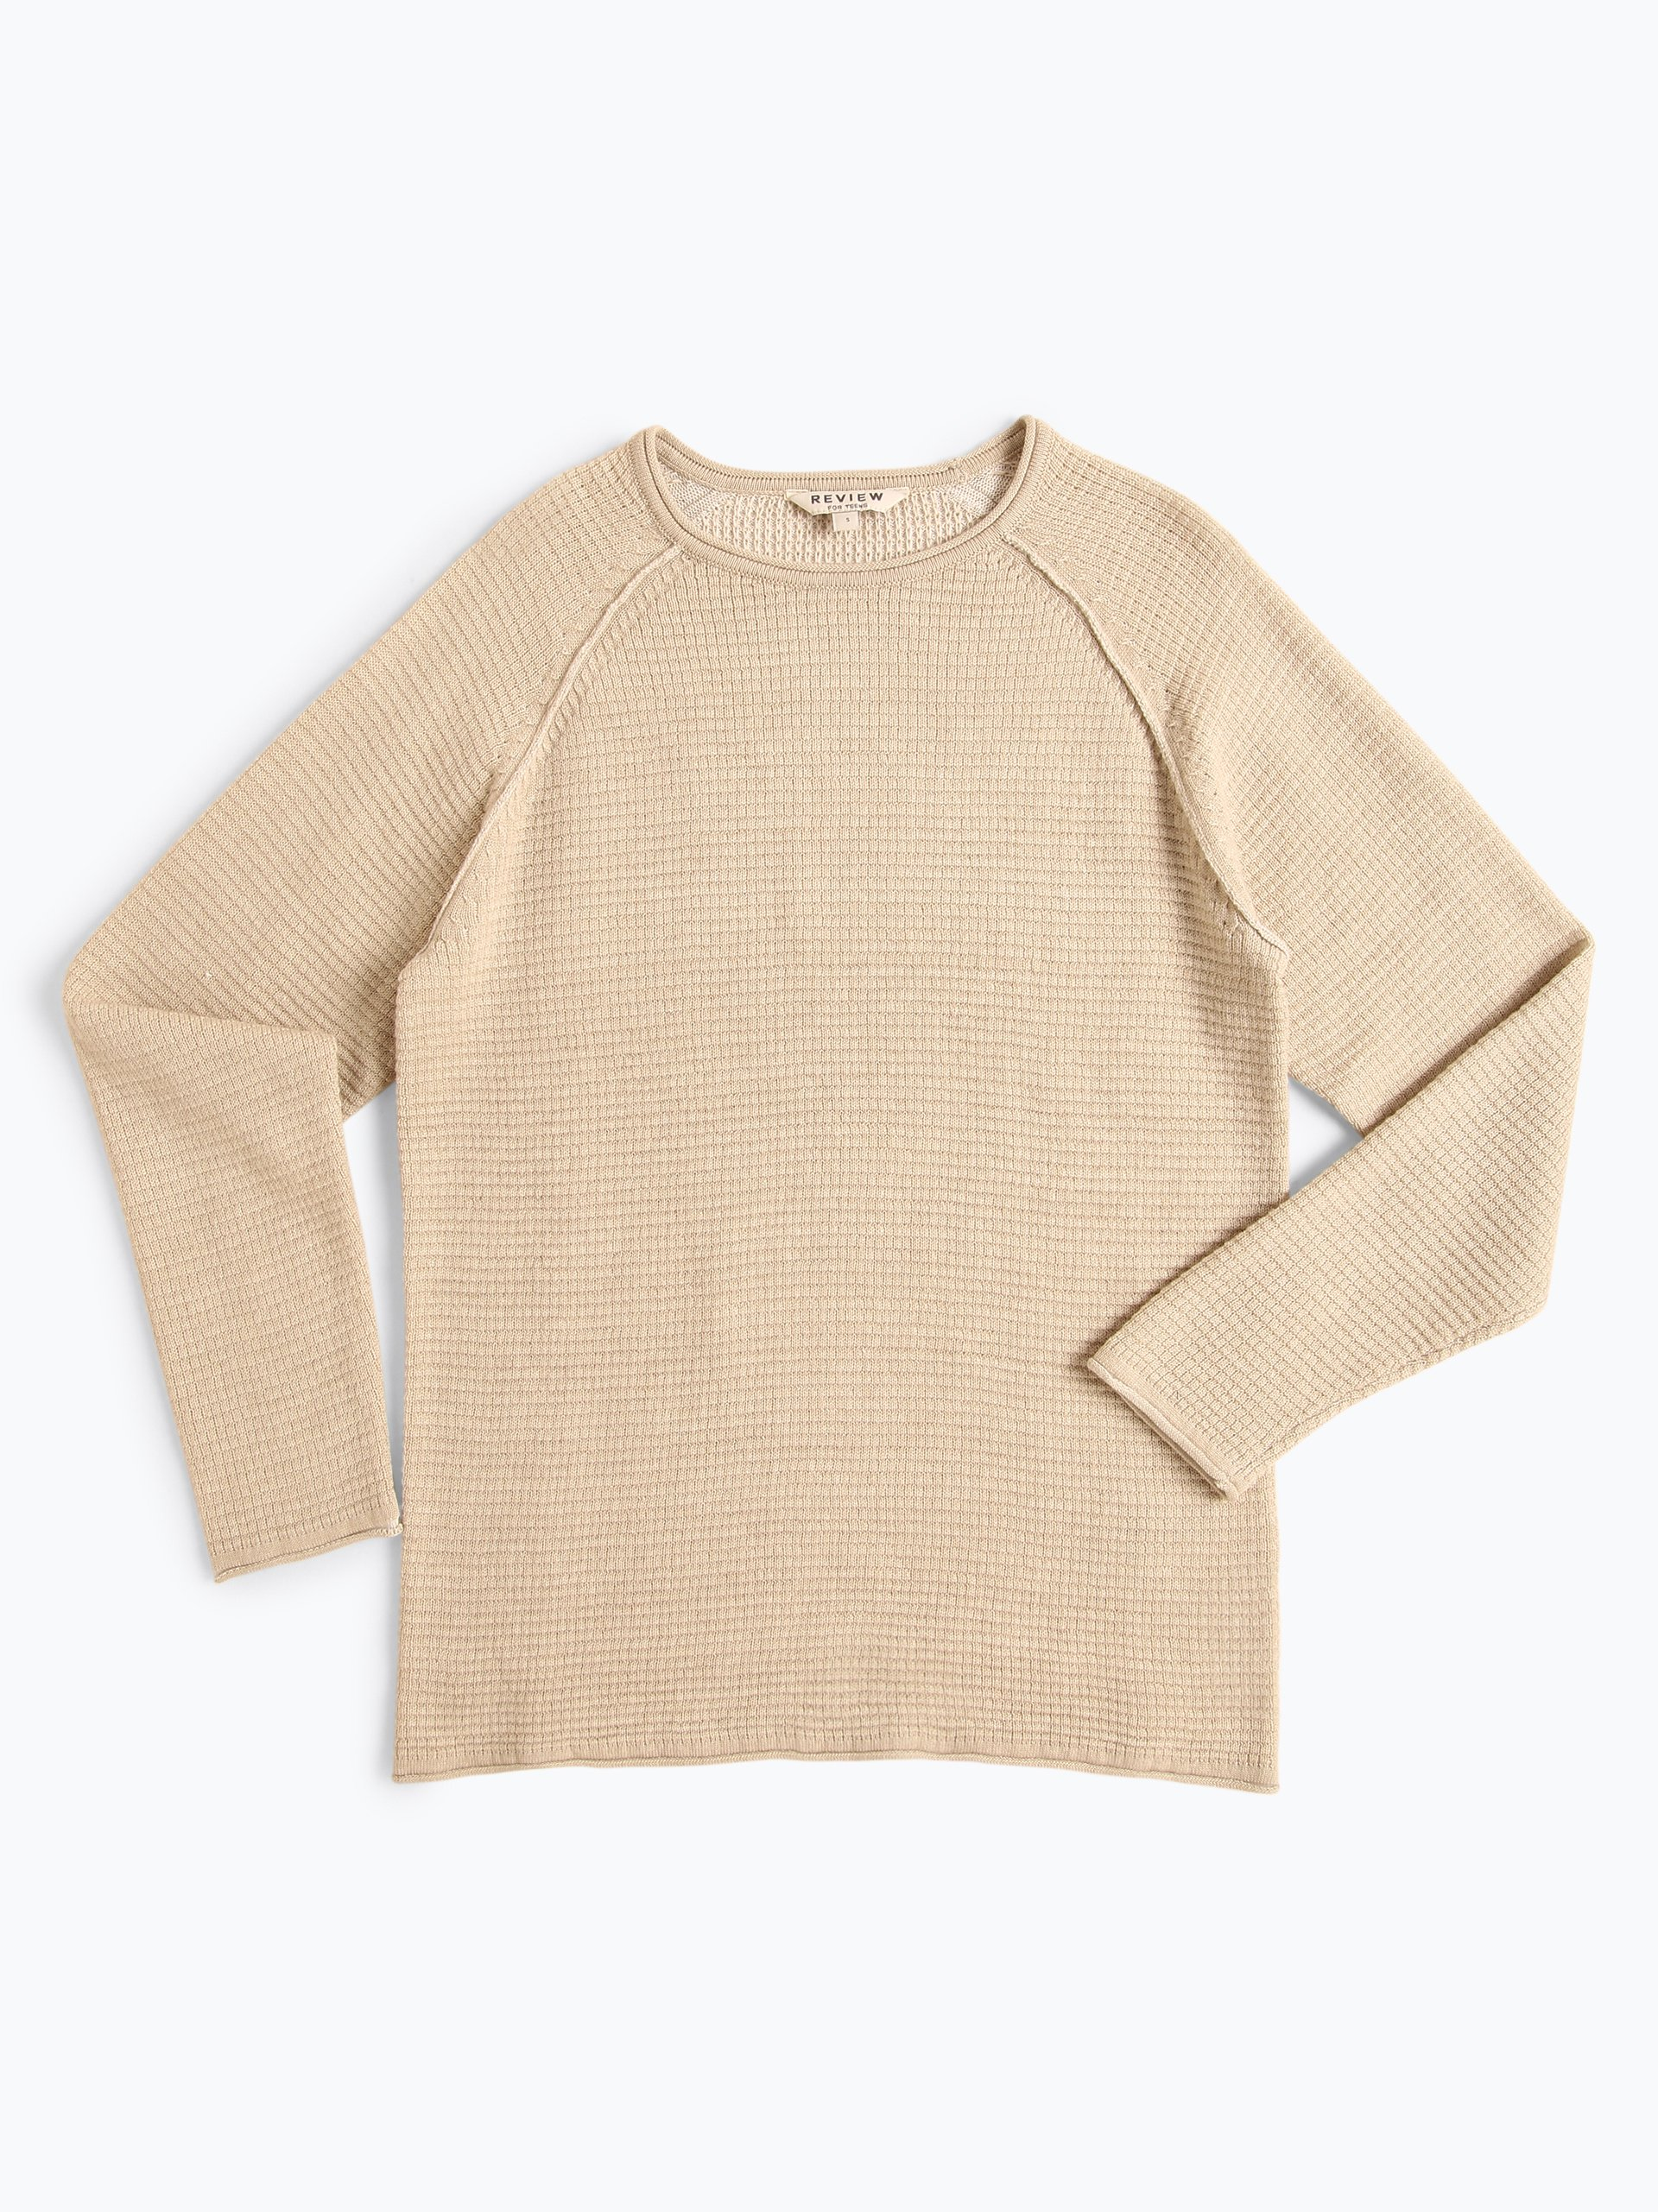 Review Jungen Pullover